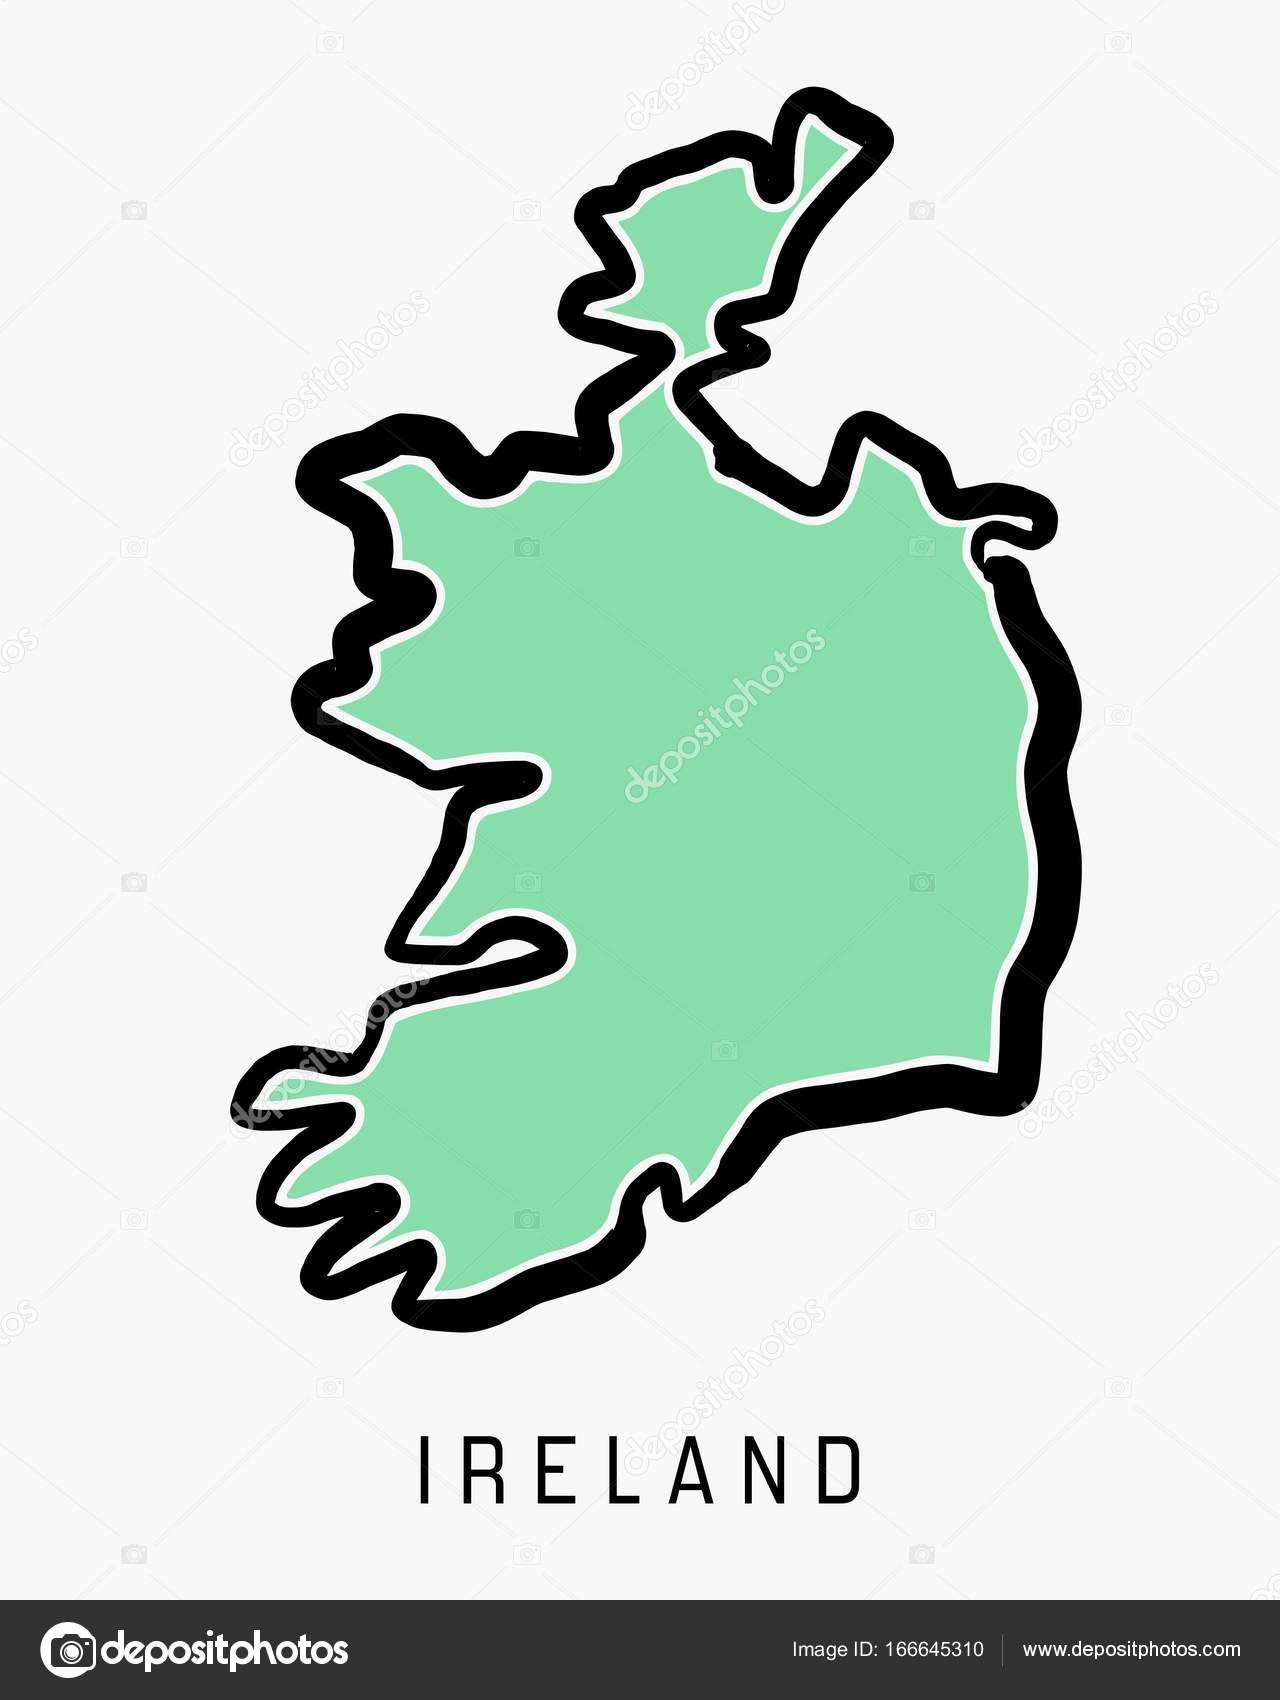 Carte Irlande Simple.Carte Simple Irlande Image Vectorielle Tupungato C 166645310